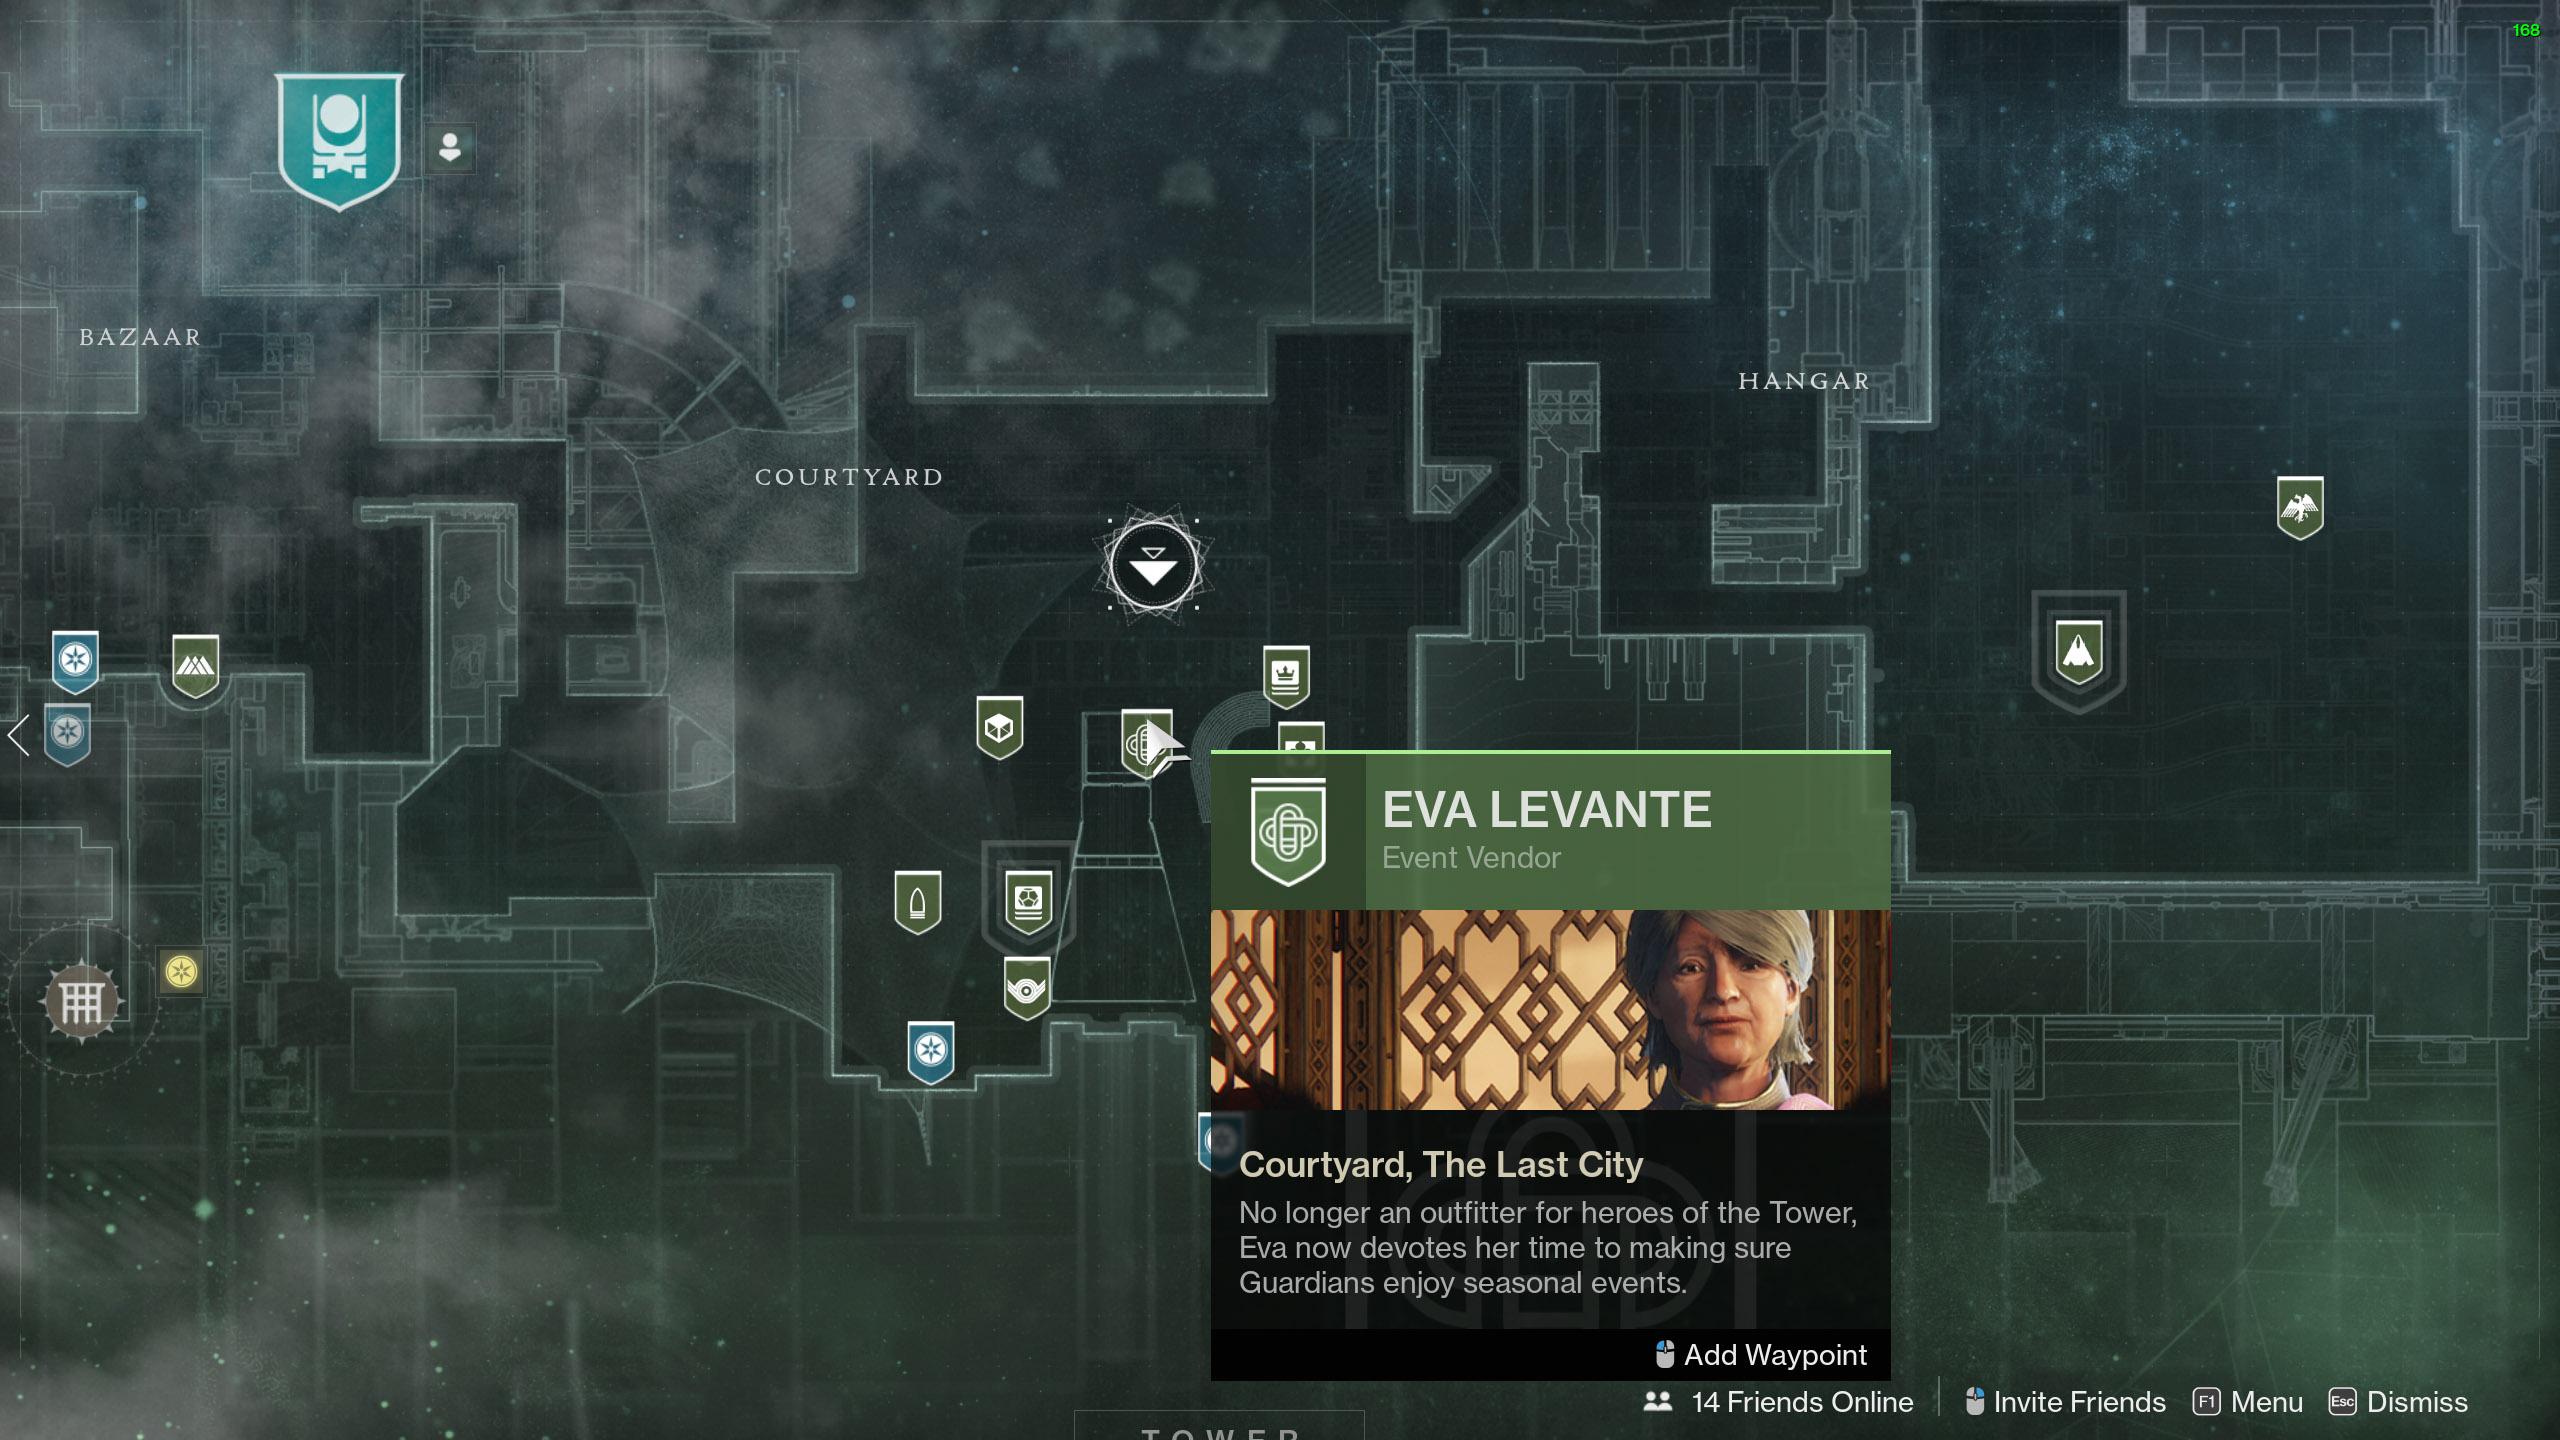 destiny 2 where to find Eva Levante